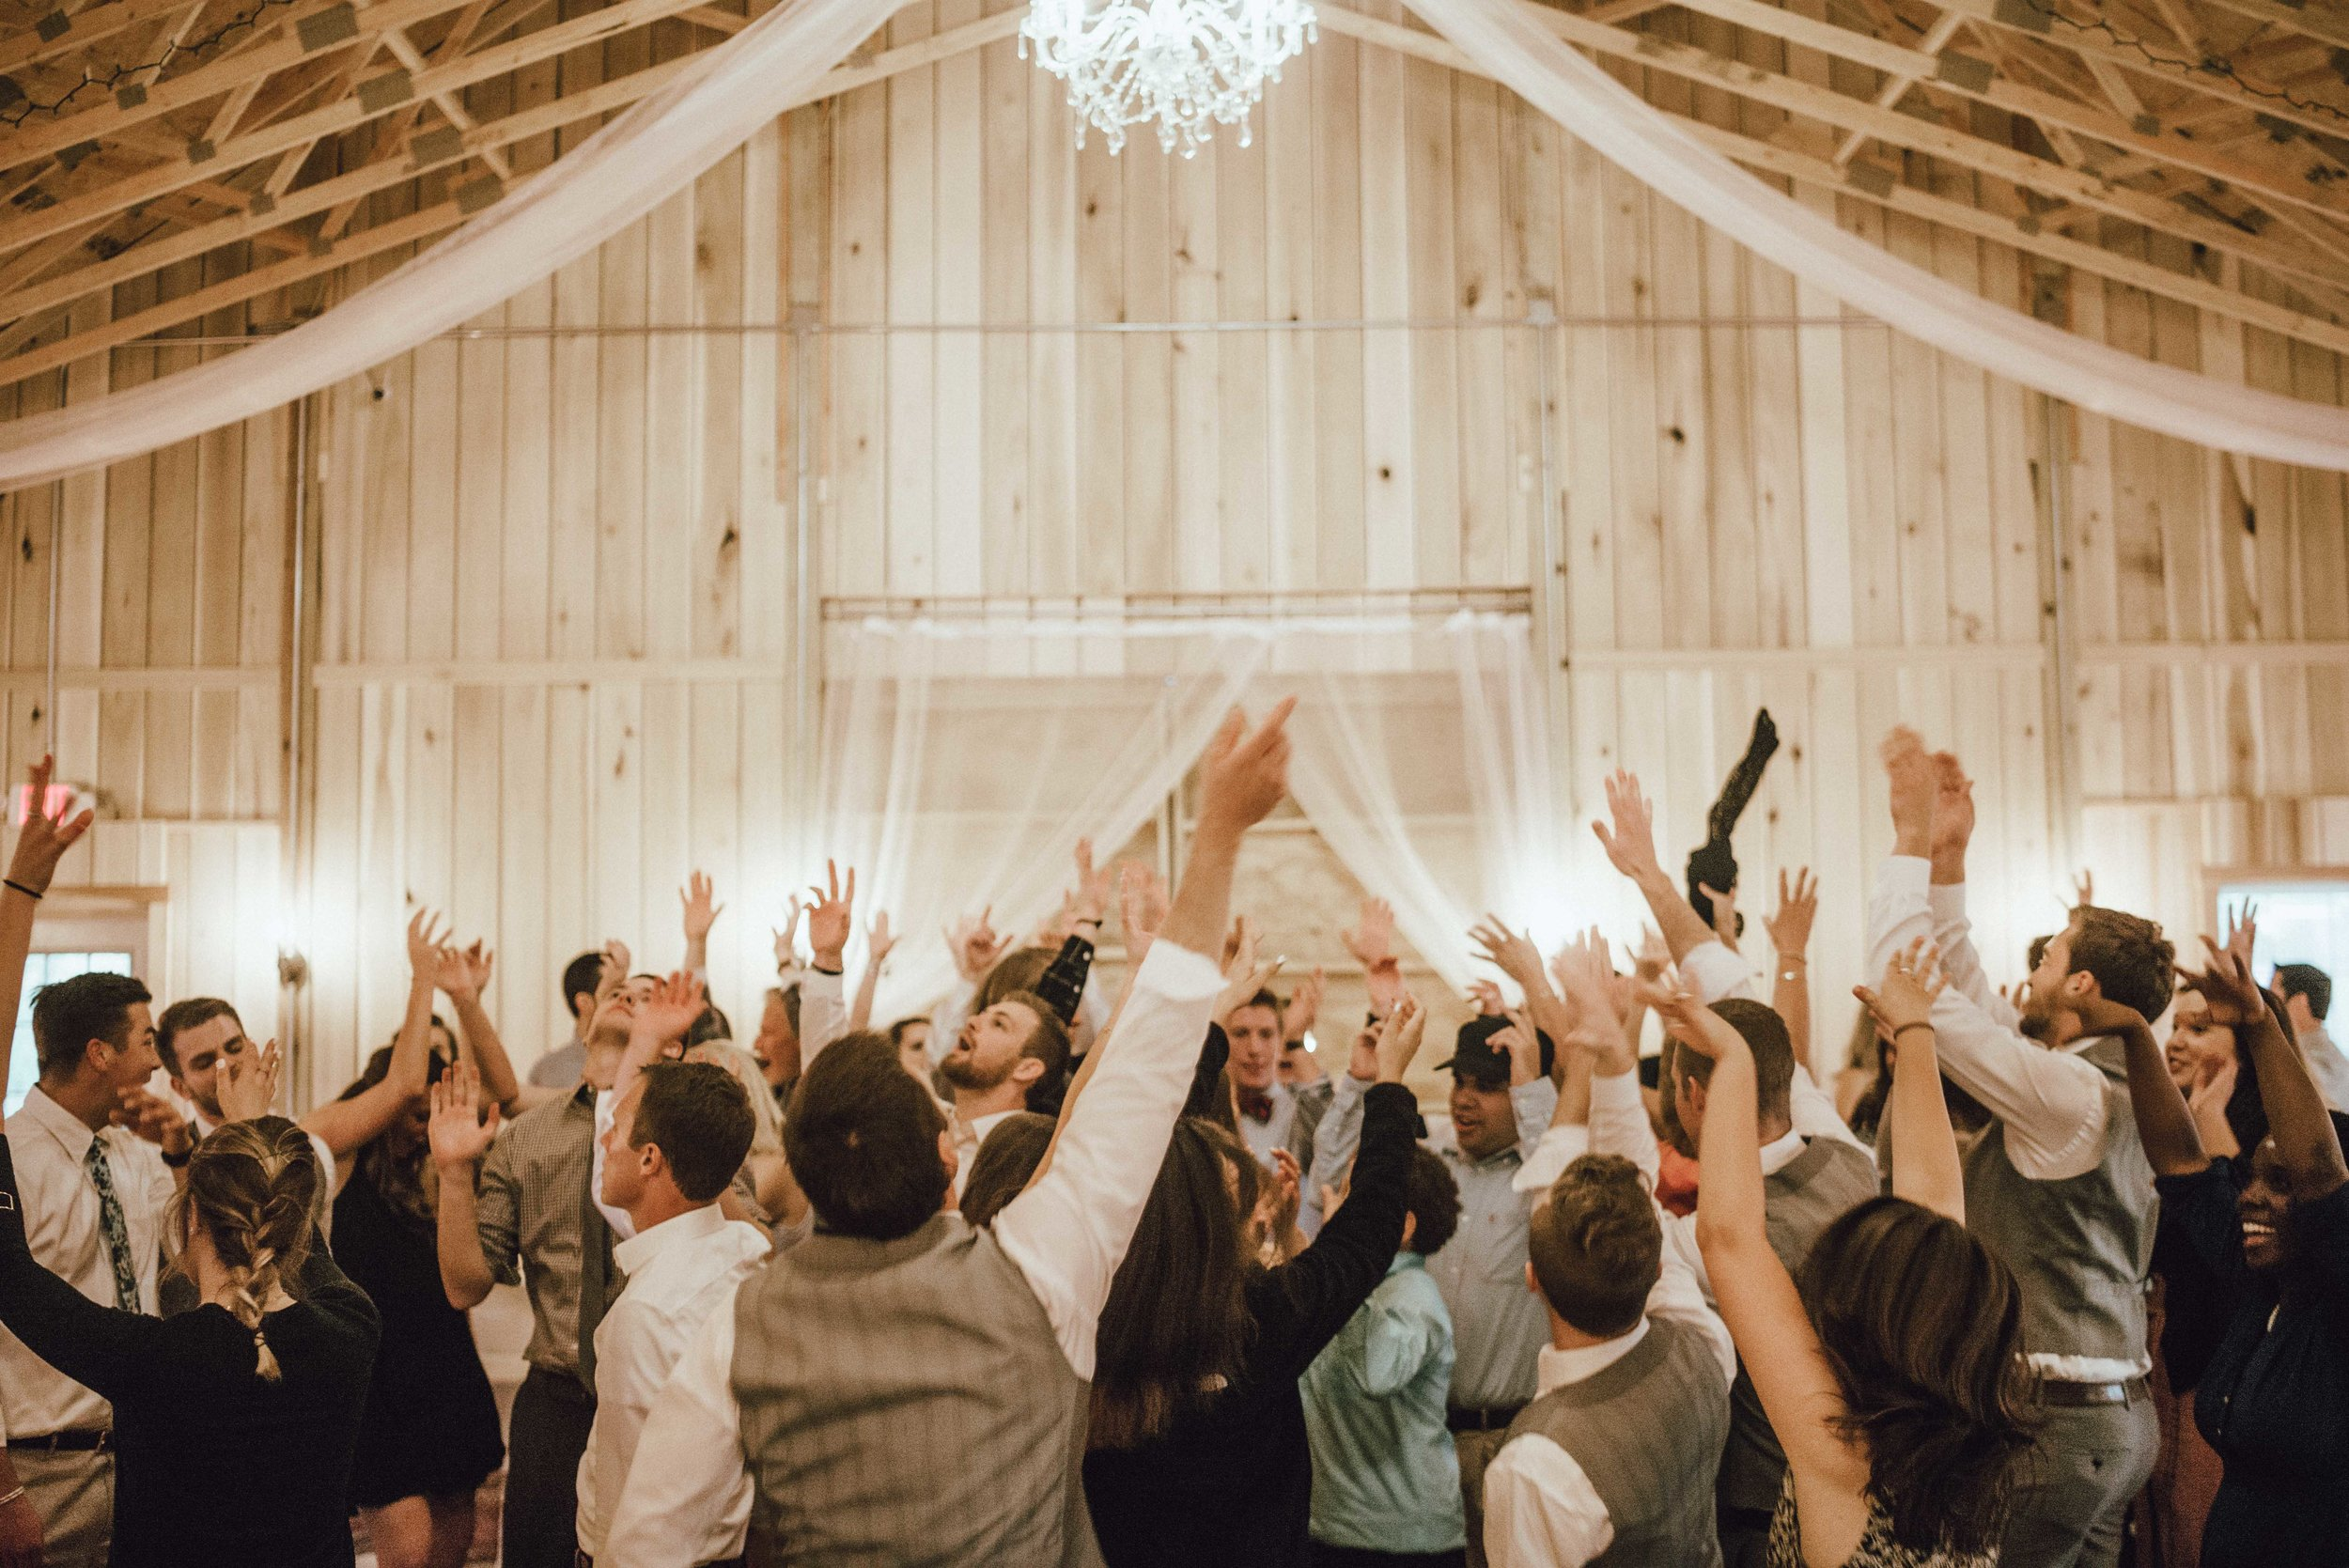 Steph-Ben-Blog-Indianapolis-Wedding-78.jpg